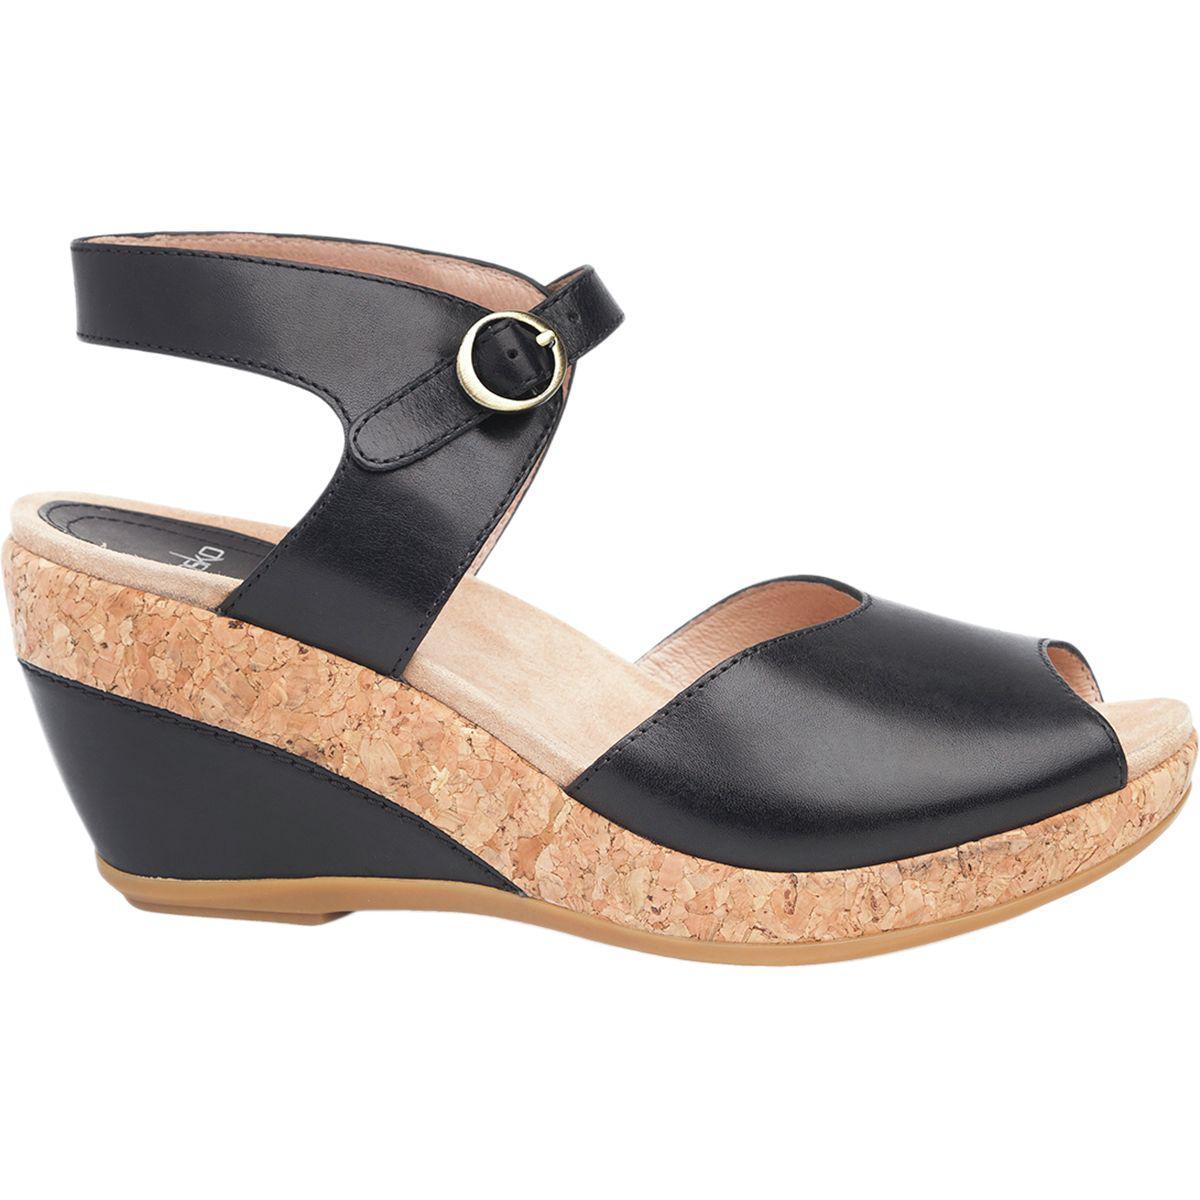 Dansko Vanda Milled Nubuck Strain Resistant Peep Toe Slingback Sandals 8cqeMbd